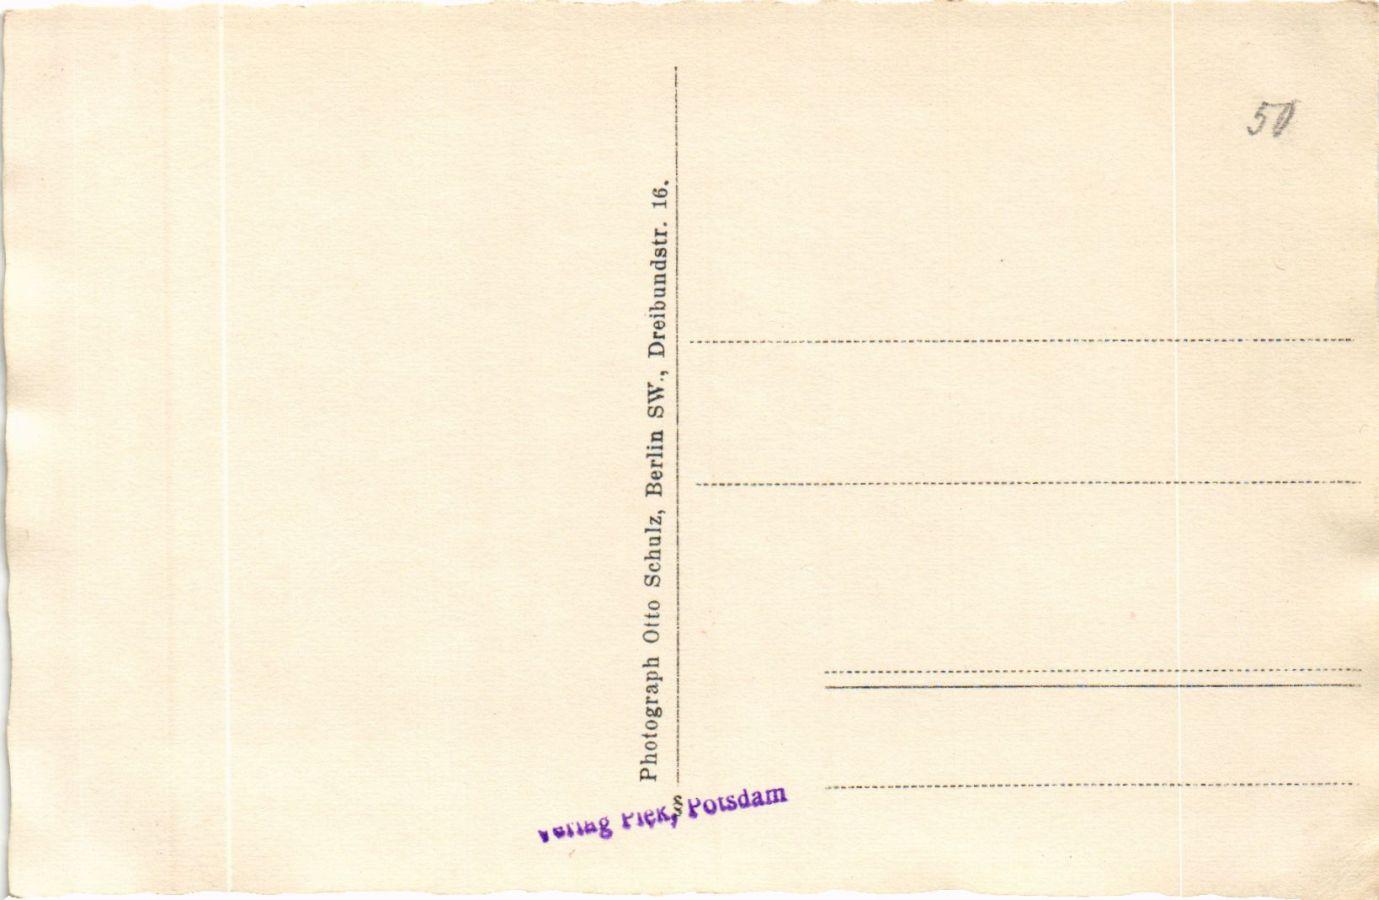 CPA-AK-Prinzenpaares-Oskar-v-Preussen-Familie-GERMAN-ROYALTY-867965 Indexbild 2